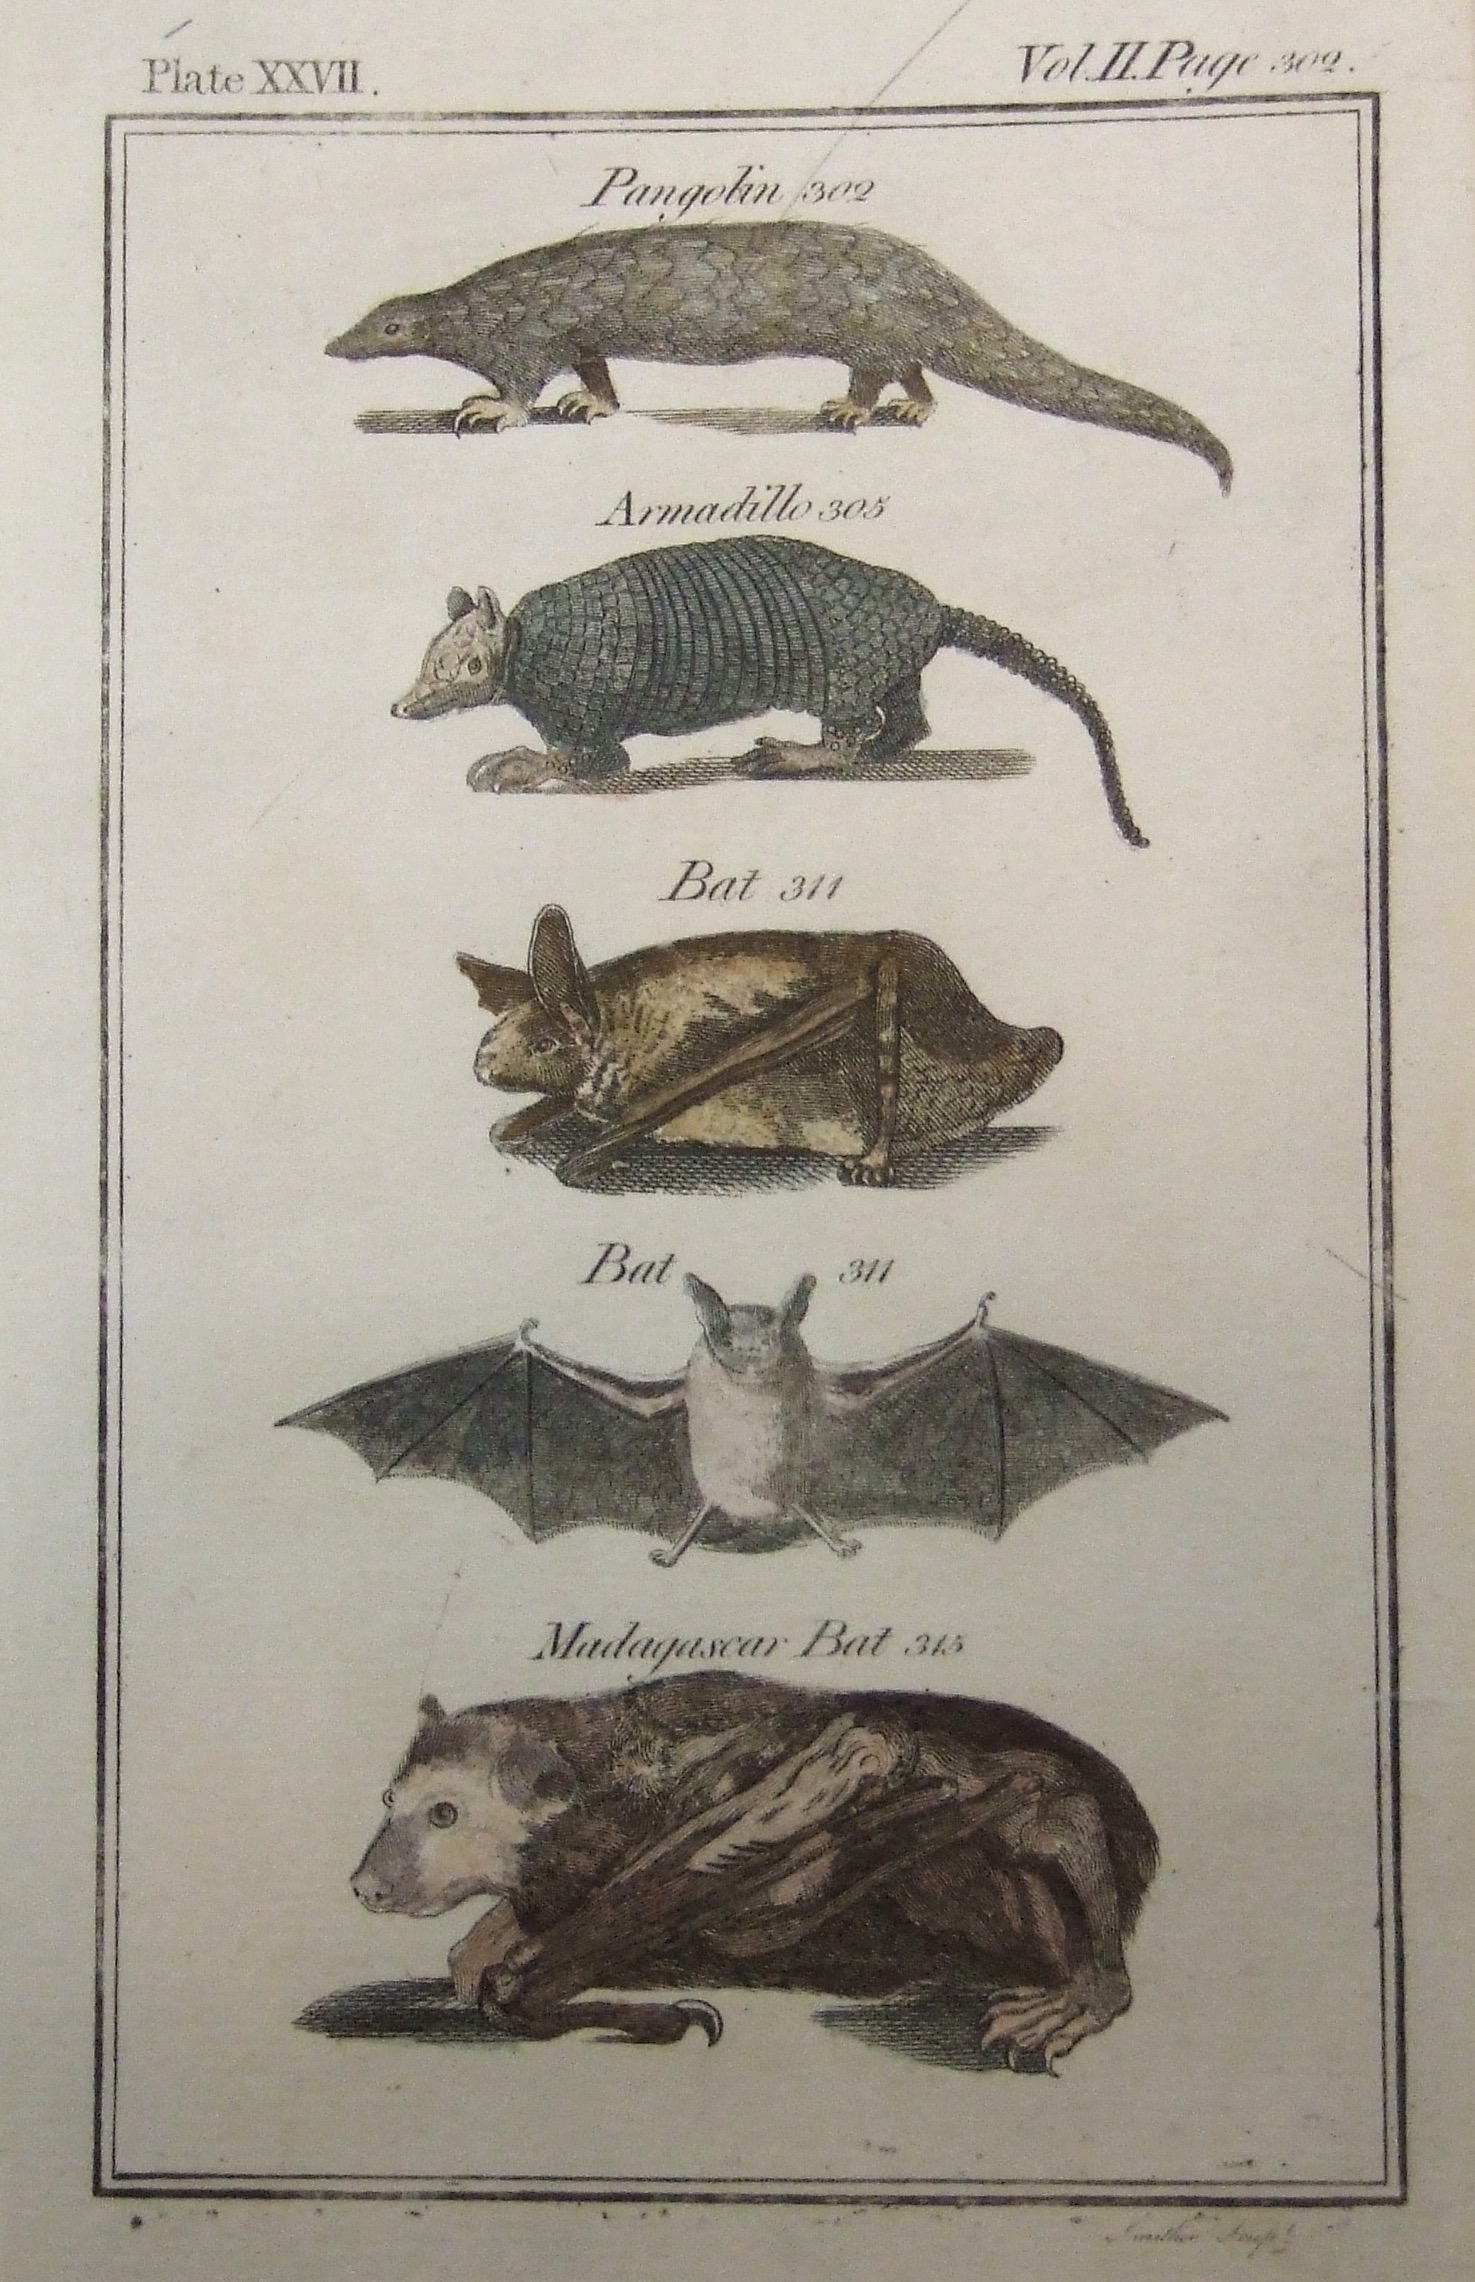 Pangolin, Armadillo, Bat, Madagascar Bat